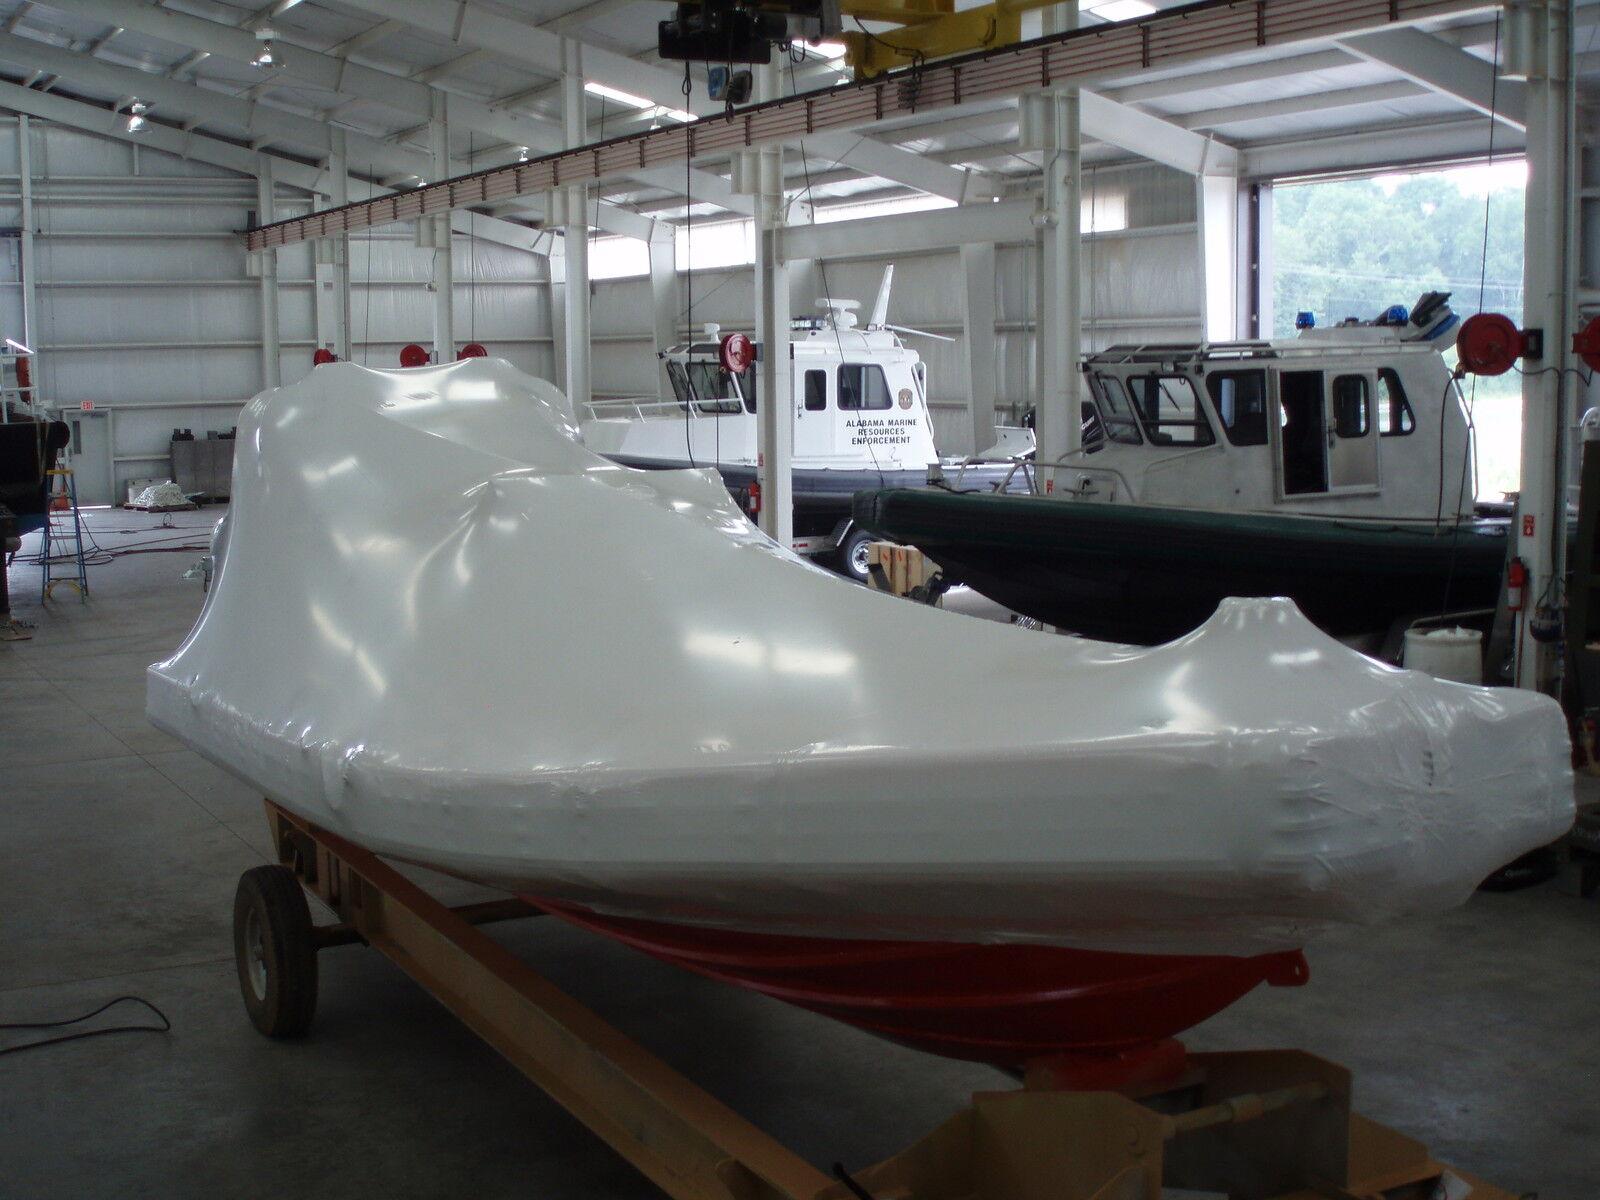 Boat Shrink Wrap Marine Shrink Wrap Start Up Kit Diy Wrap Your Own Boat $$white